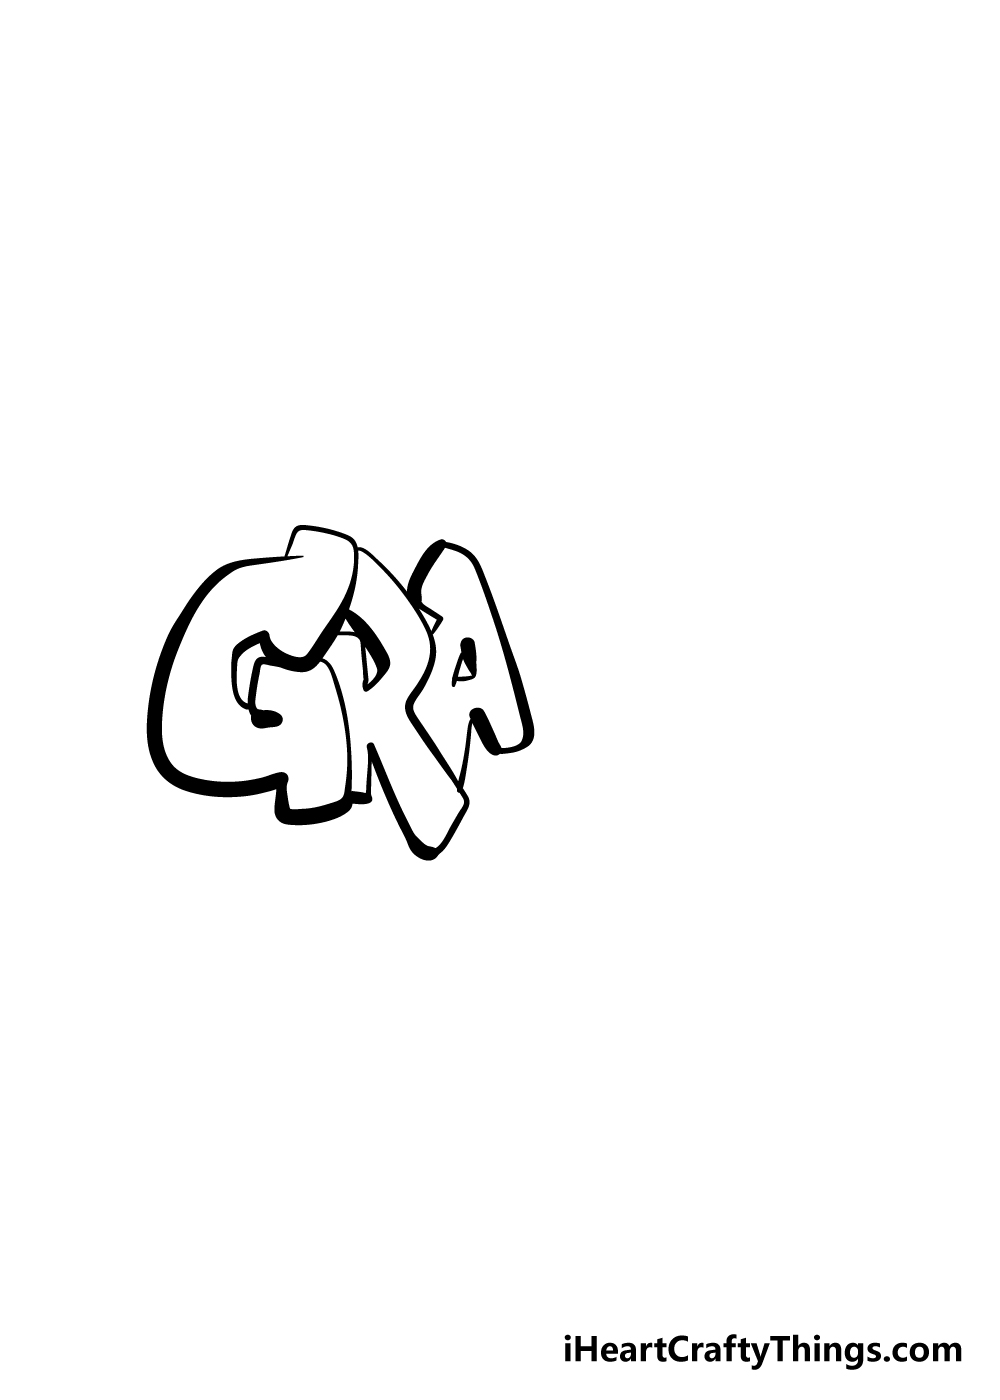 graffiti drawing step 3